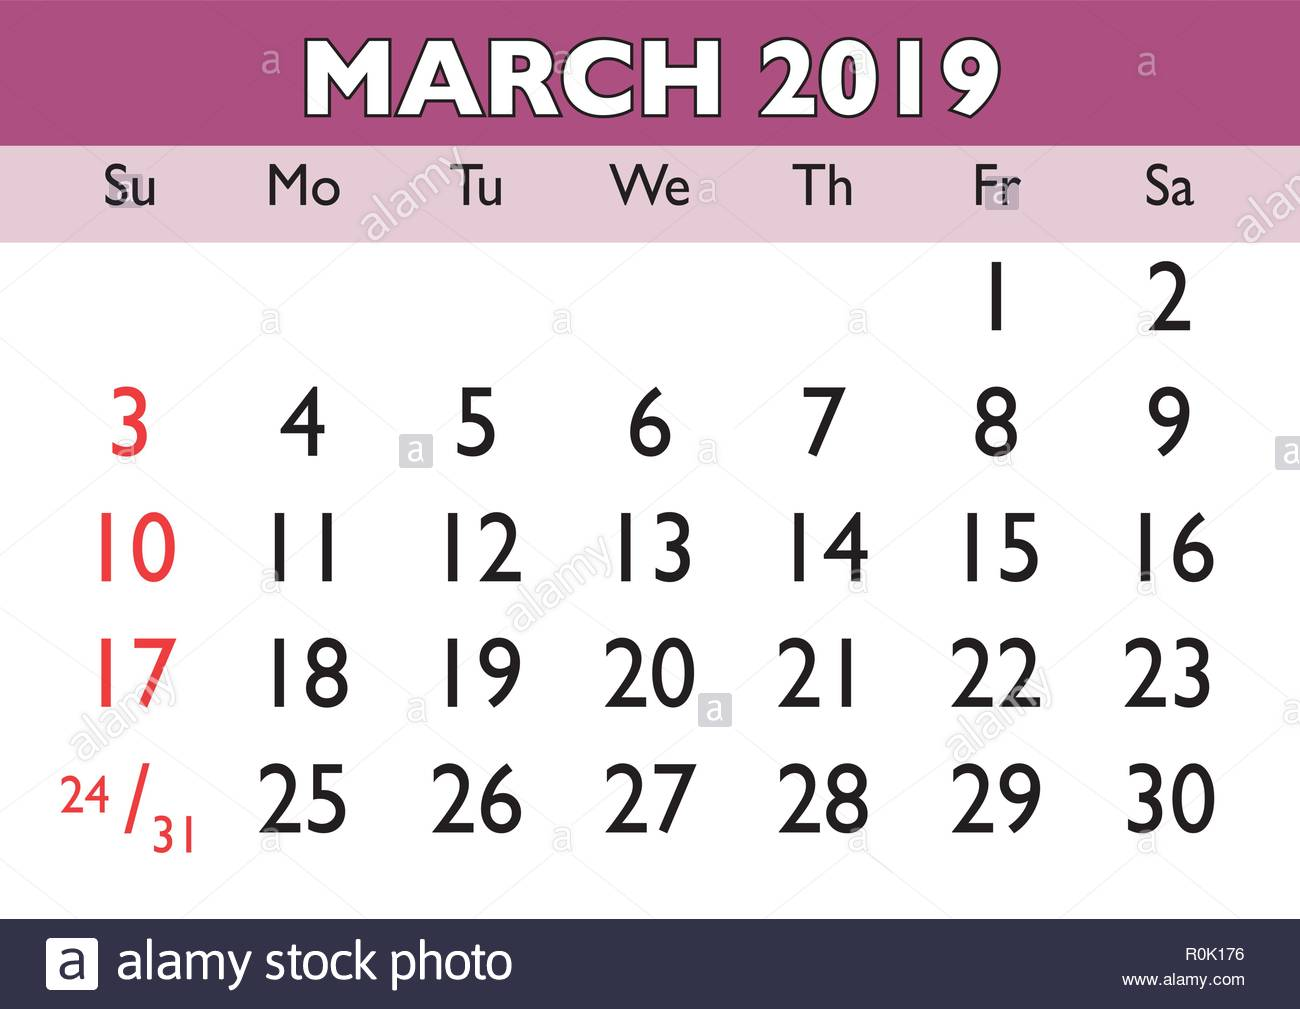 2019 calendar march month vector printable calendar monthly scheduler week starts on sunday english calendar